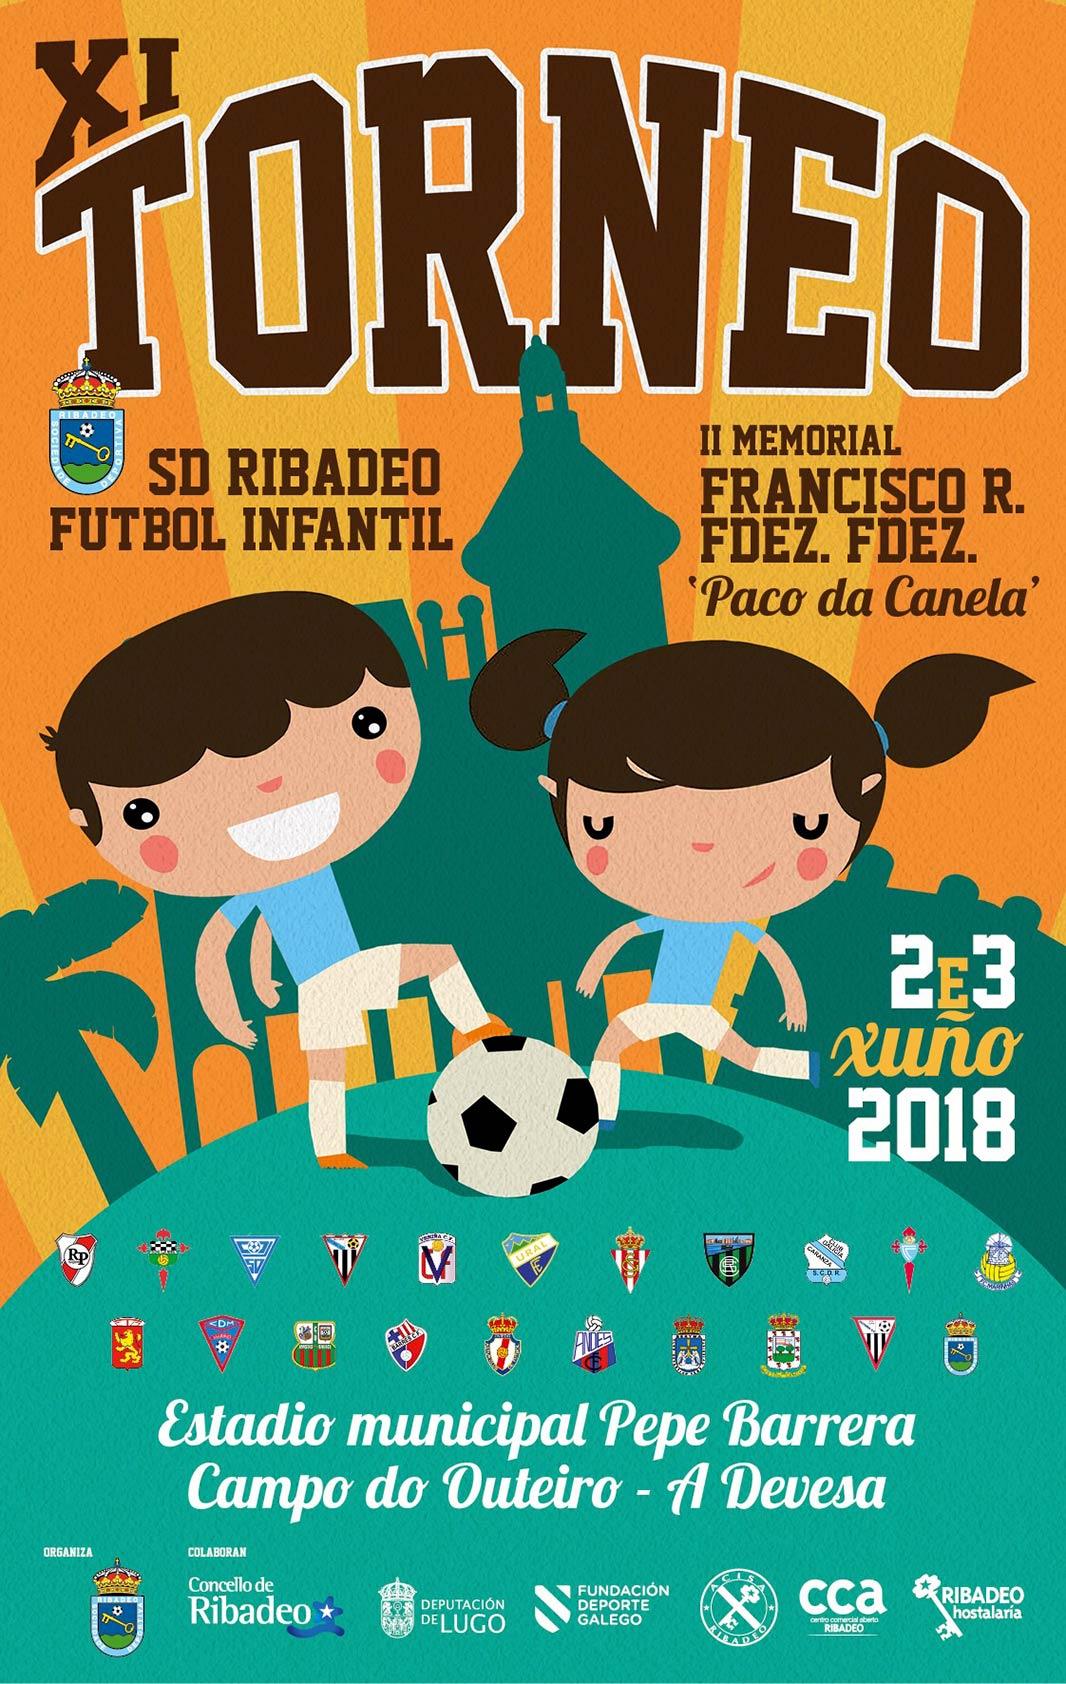 XI Torneo Infantil